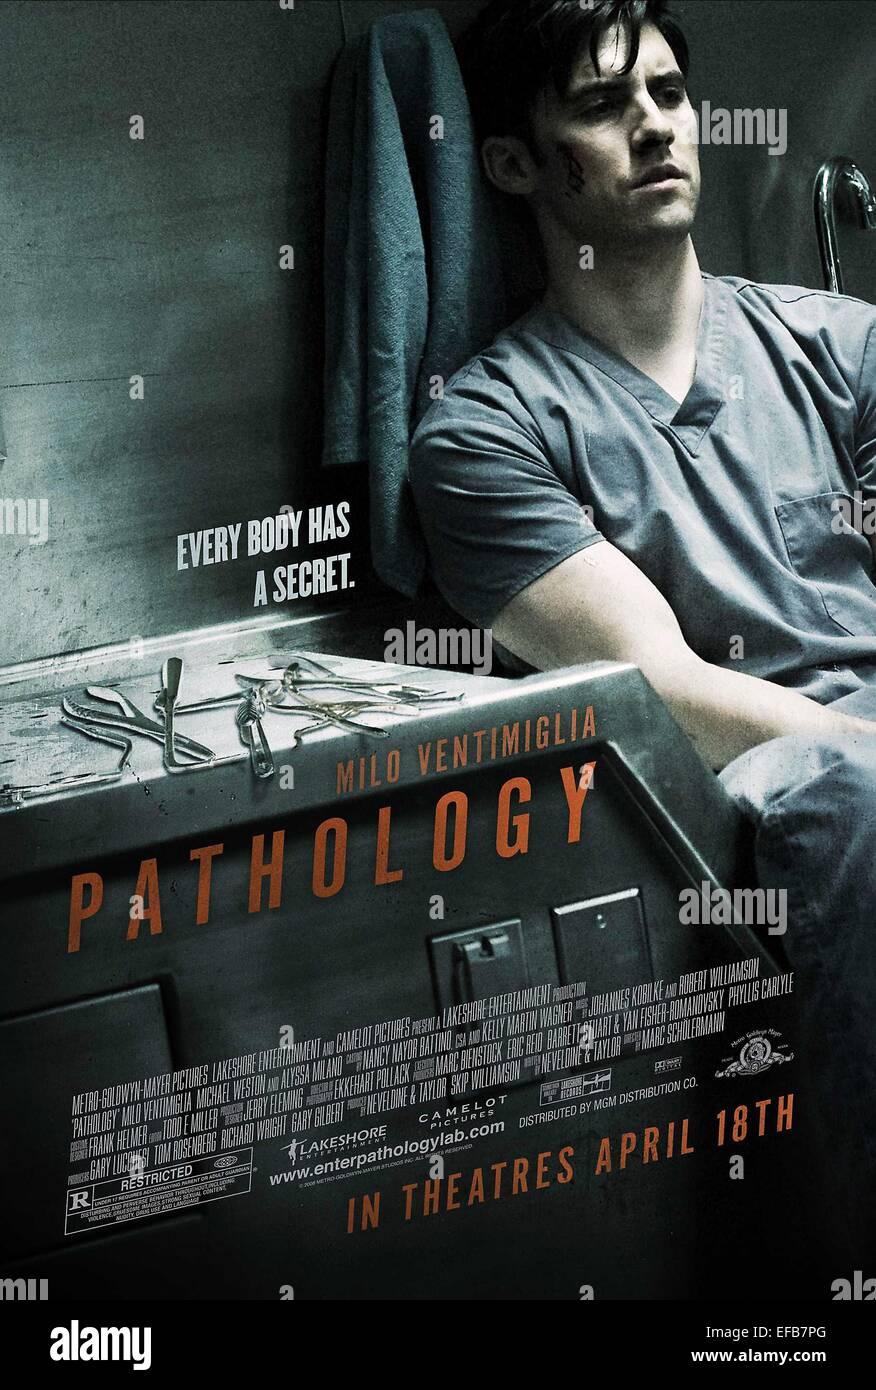 MOVIE POSTER PATHOLOGY (2008) - Stock Image